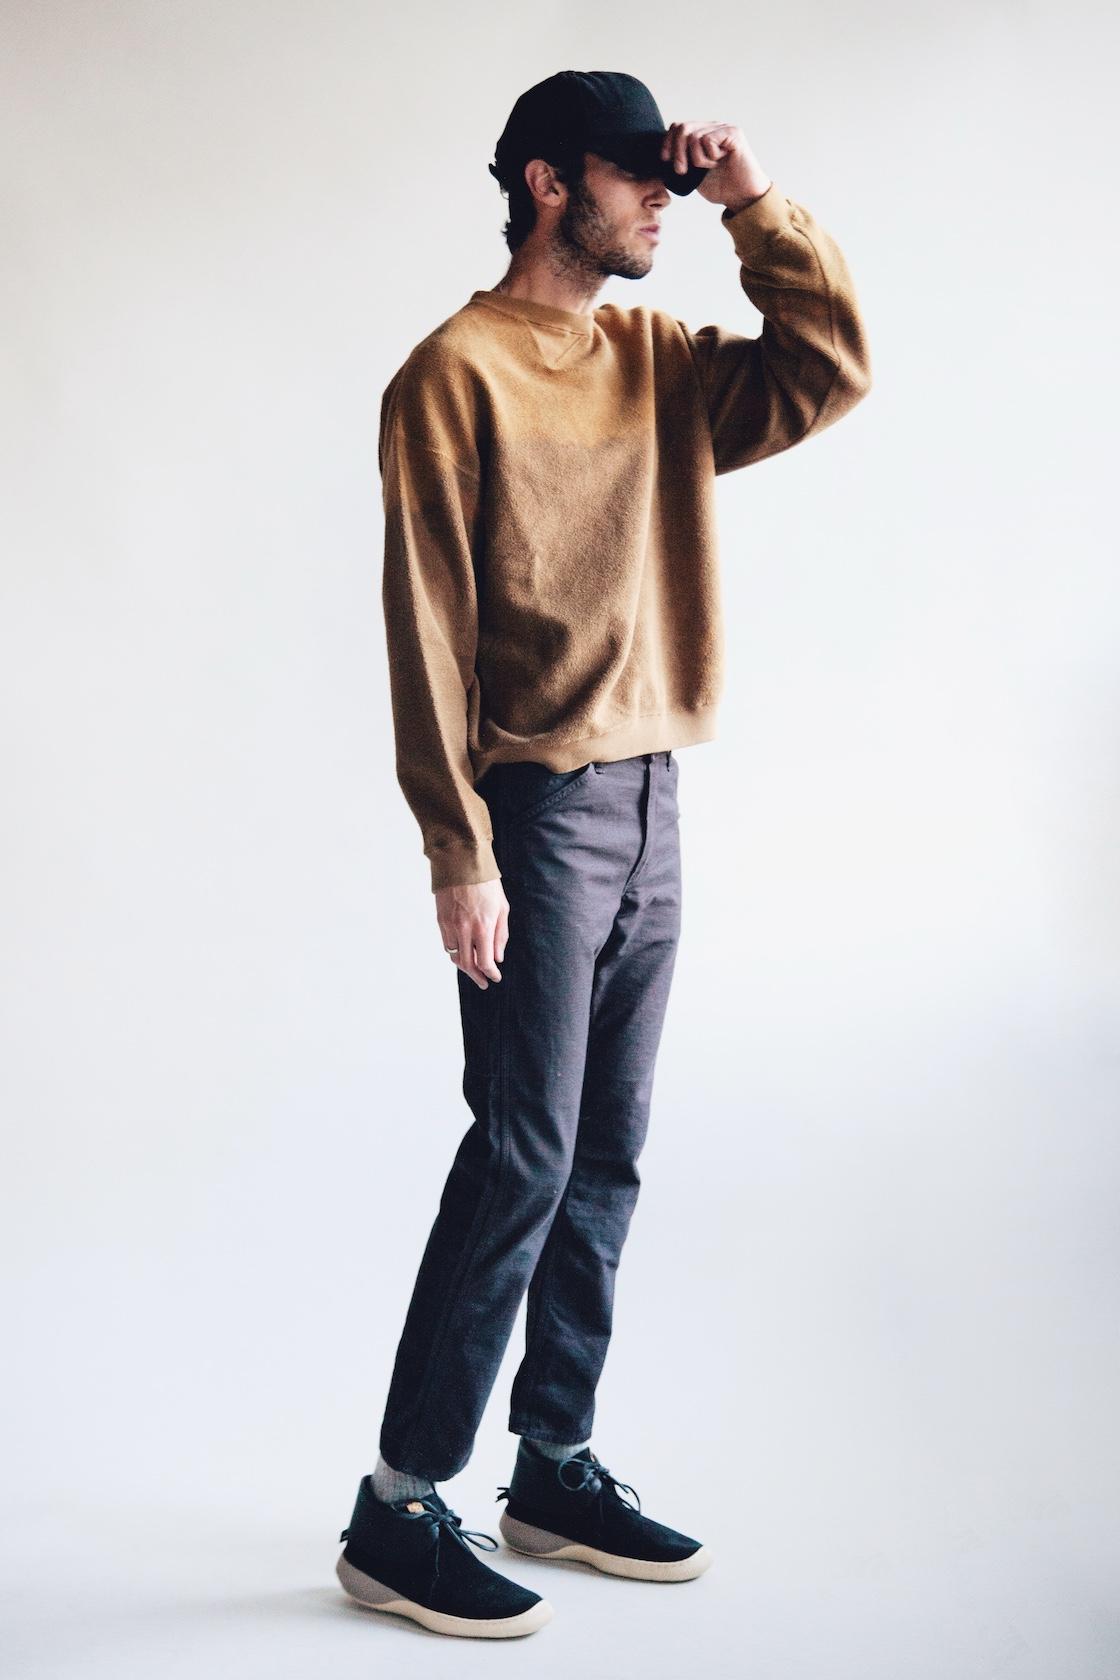 Hender scheme 2 tone wool cap, Noma t.d. breach twist sweatshirt, orslow canoe club painter pants and ute moc trainer shoes from visvim on body